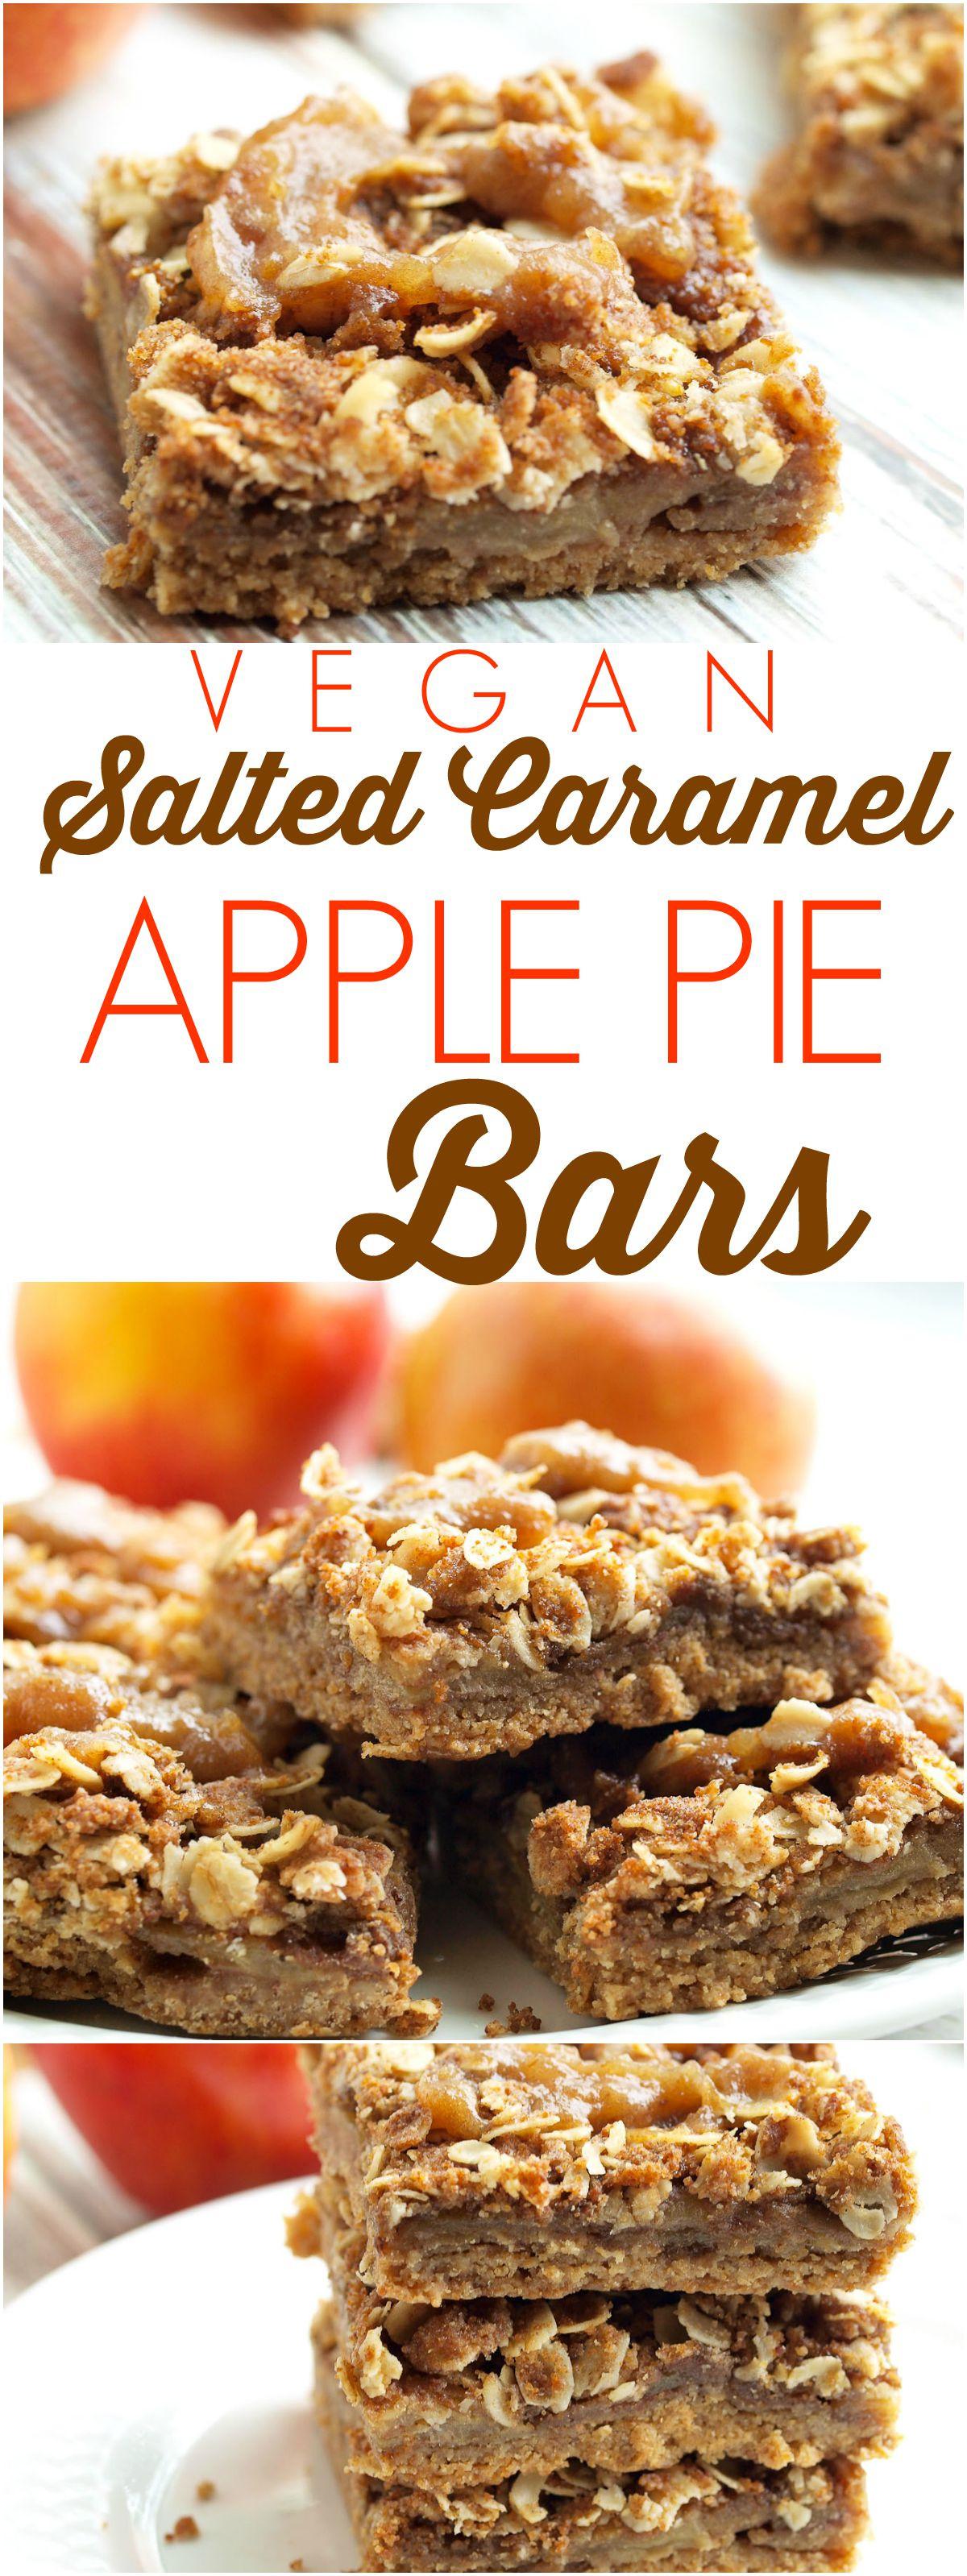 Vegan Baking Recipes  Vegan Salted Caramel Apple Pie Bars Happy Healthy Mama